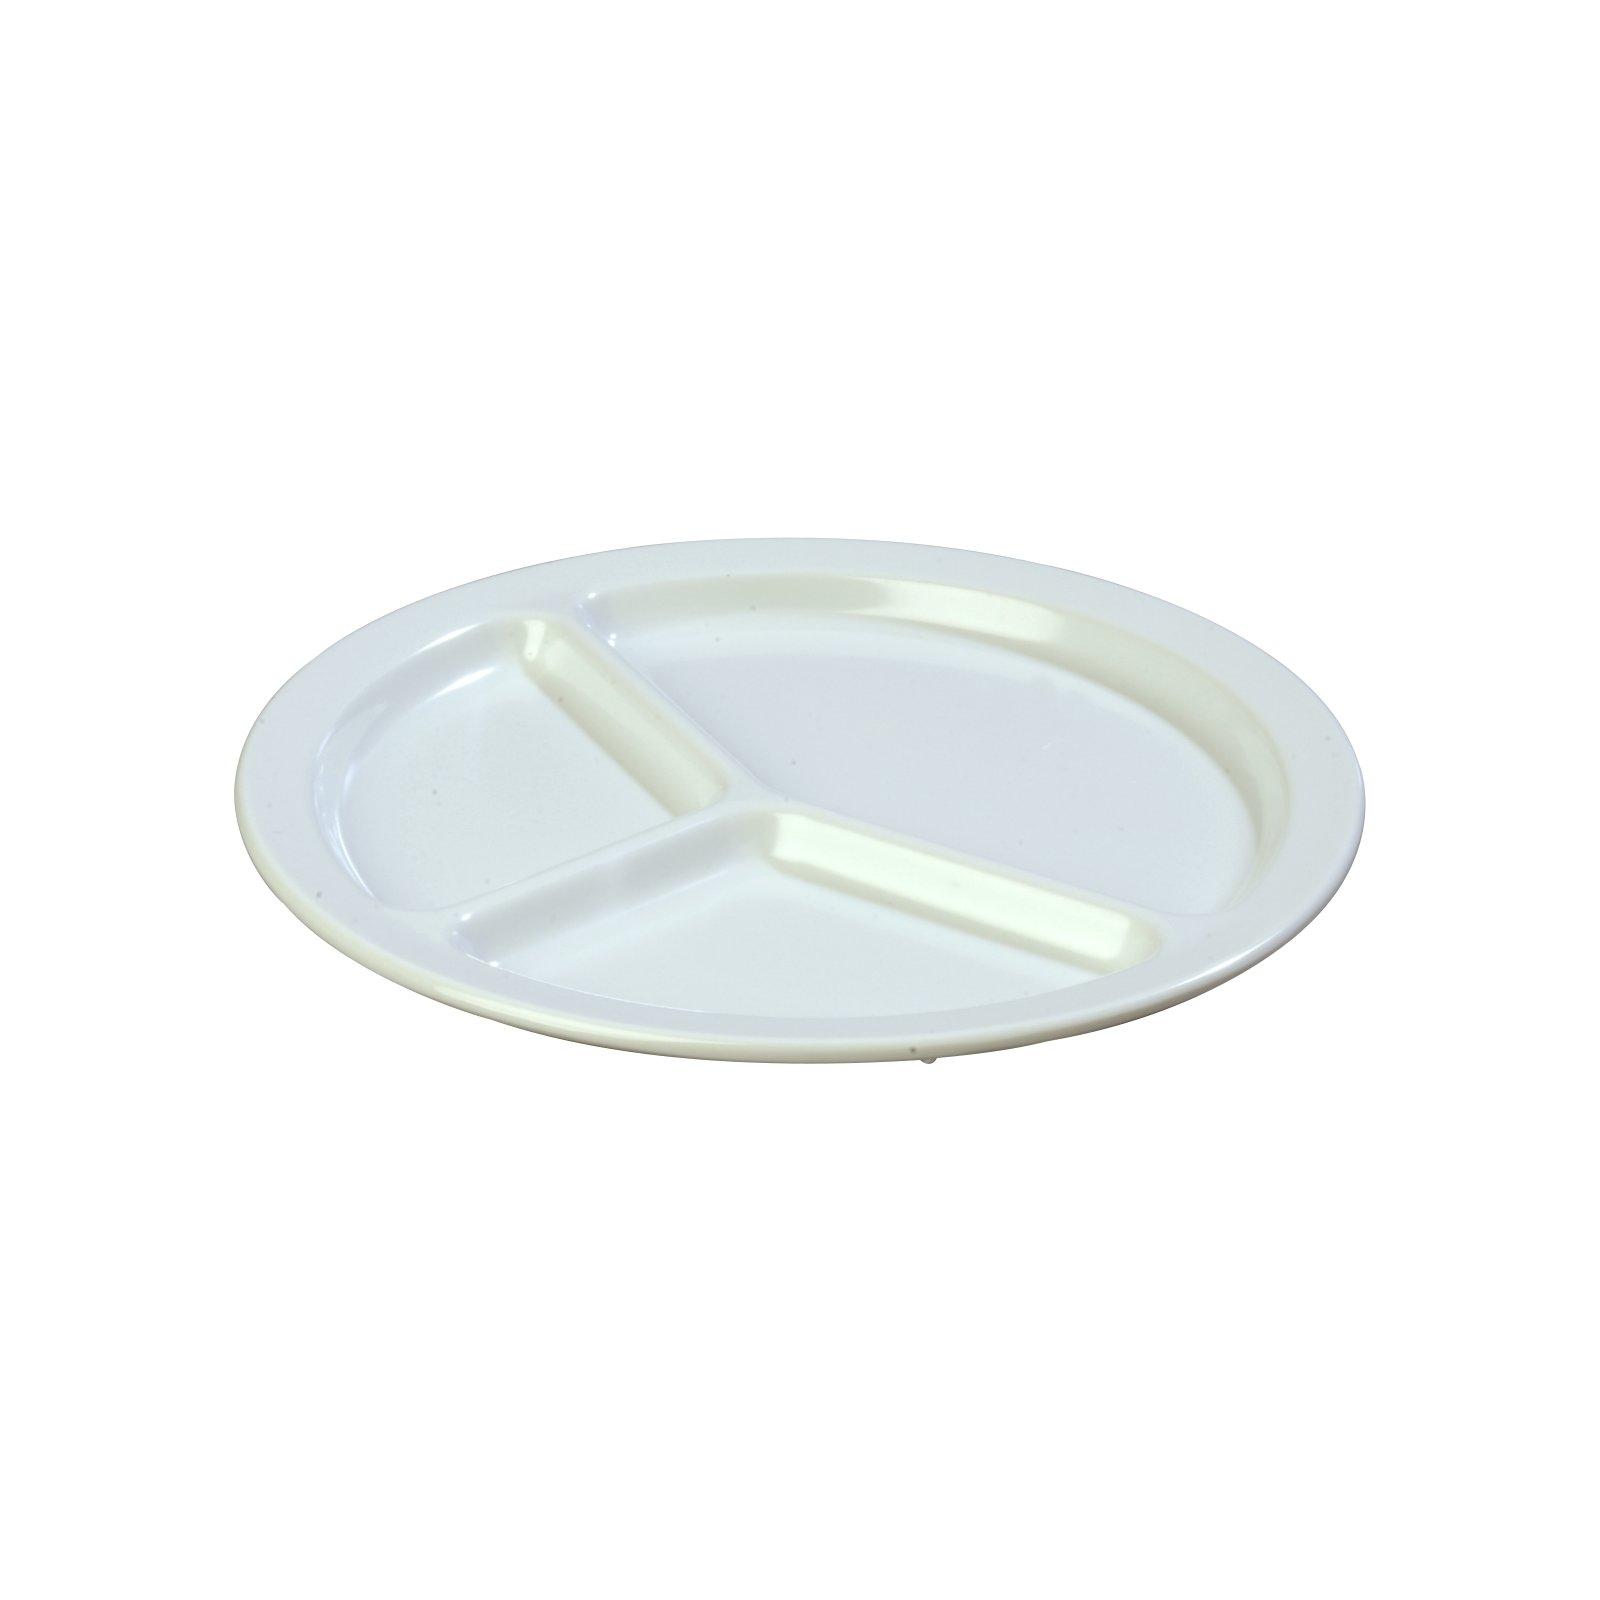 KL10202 - Kingline™ Melamine 3-Compartment Plate 10\